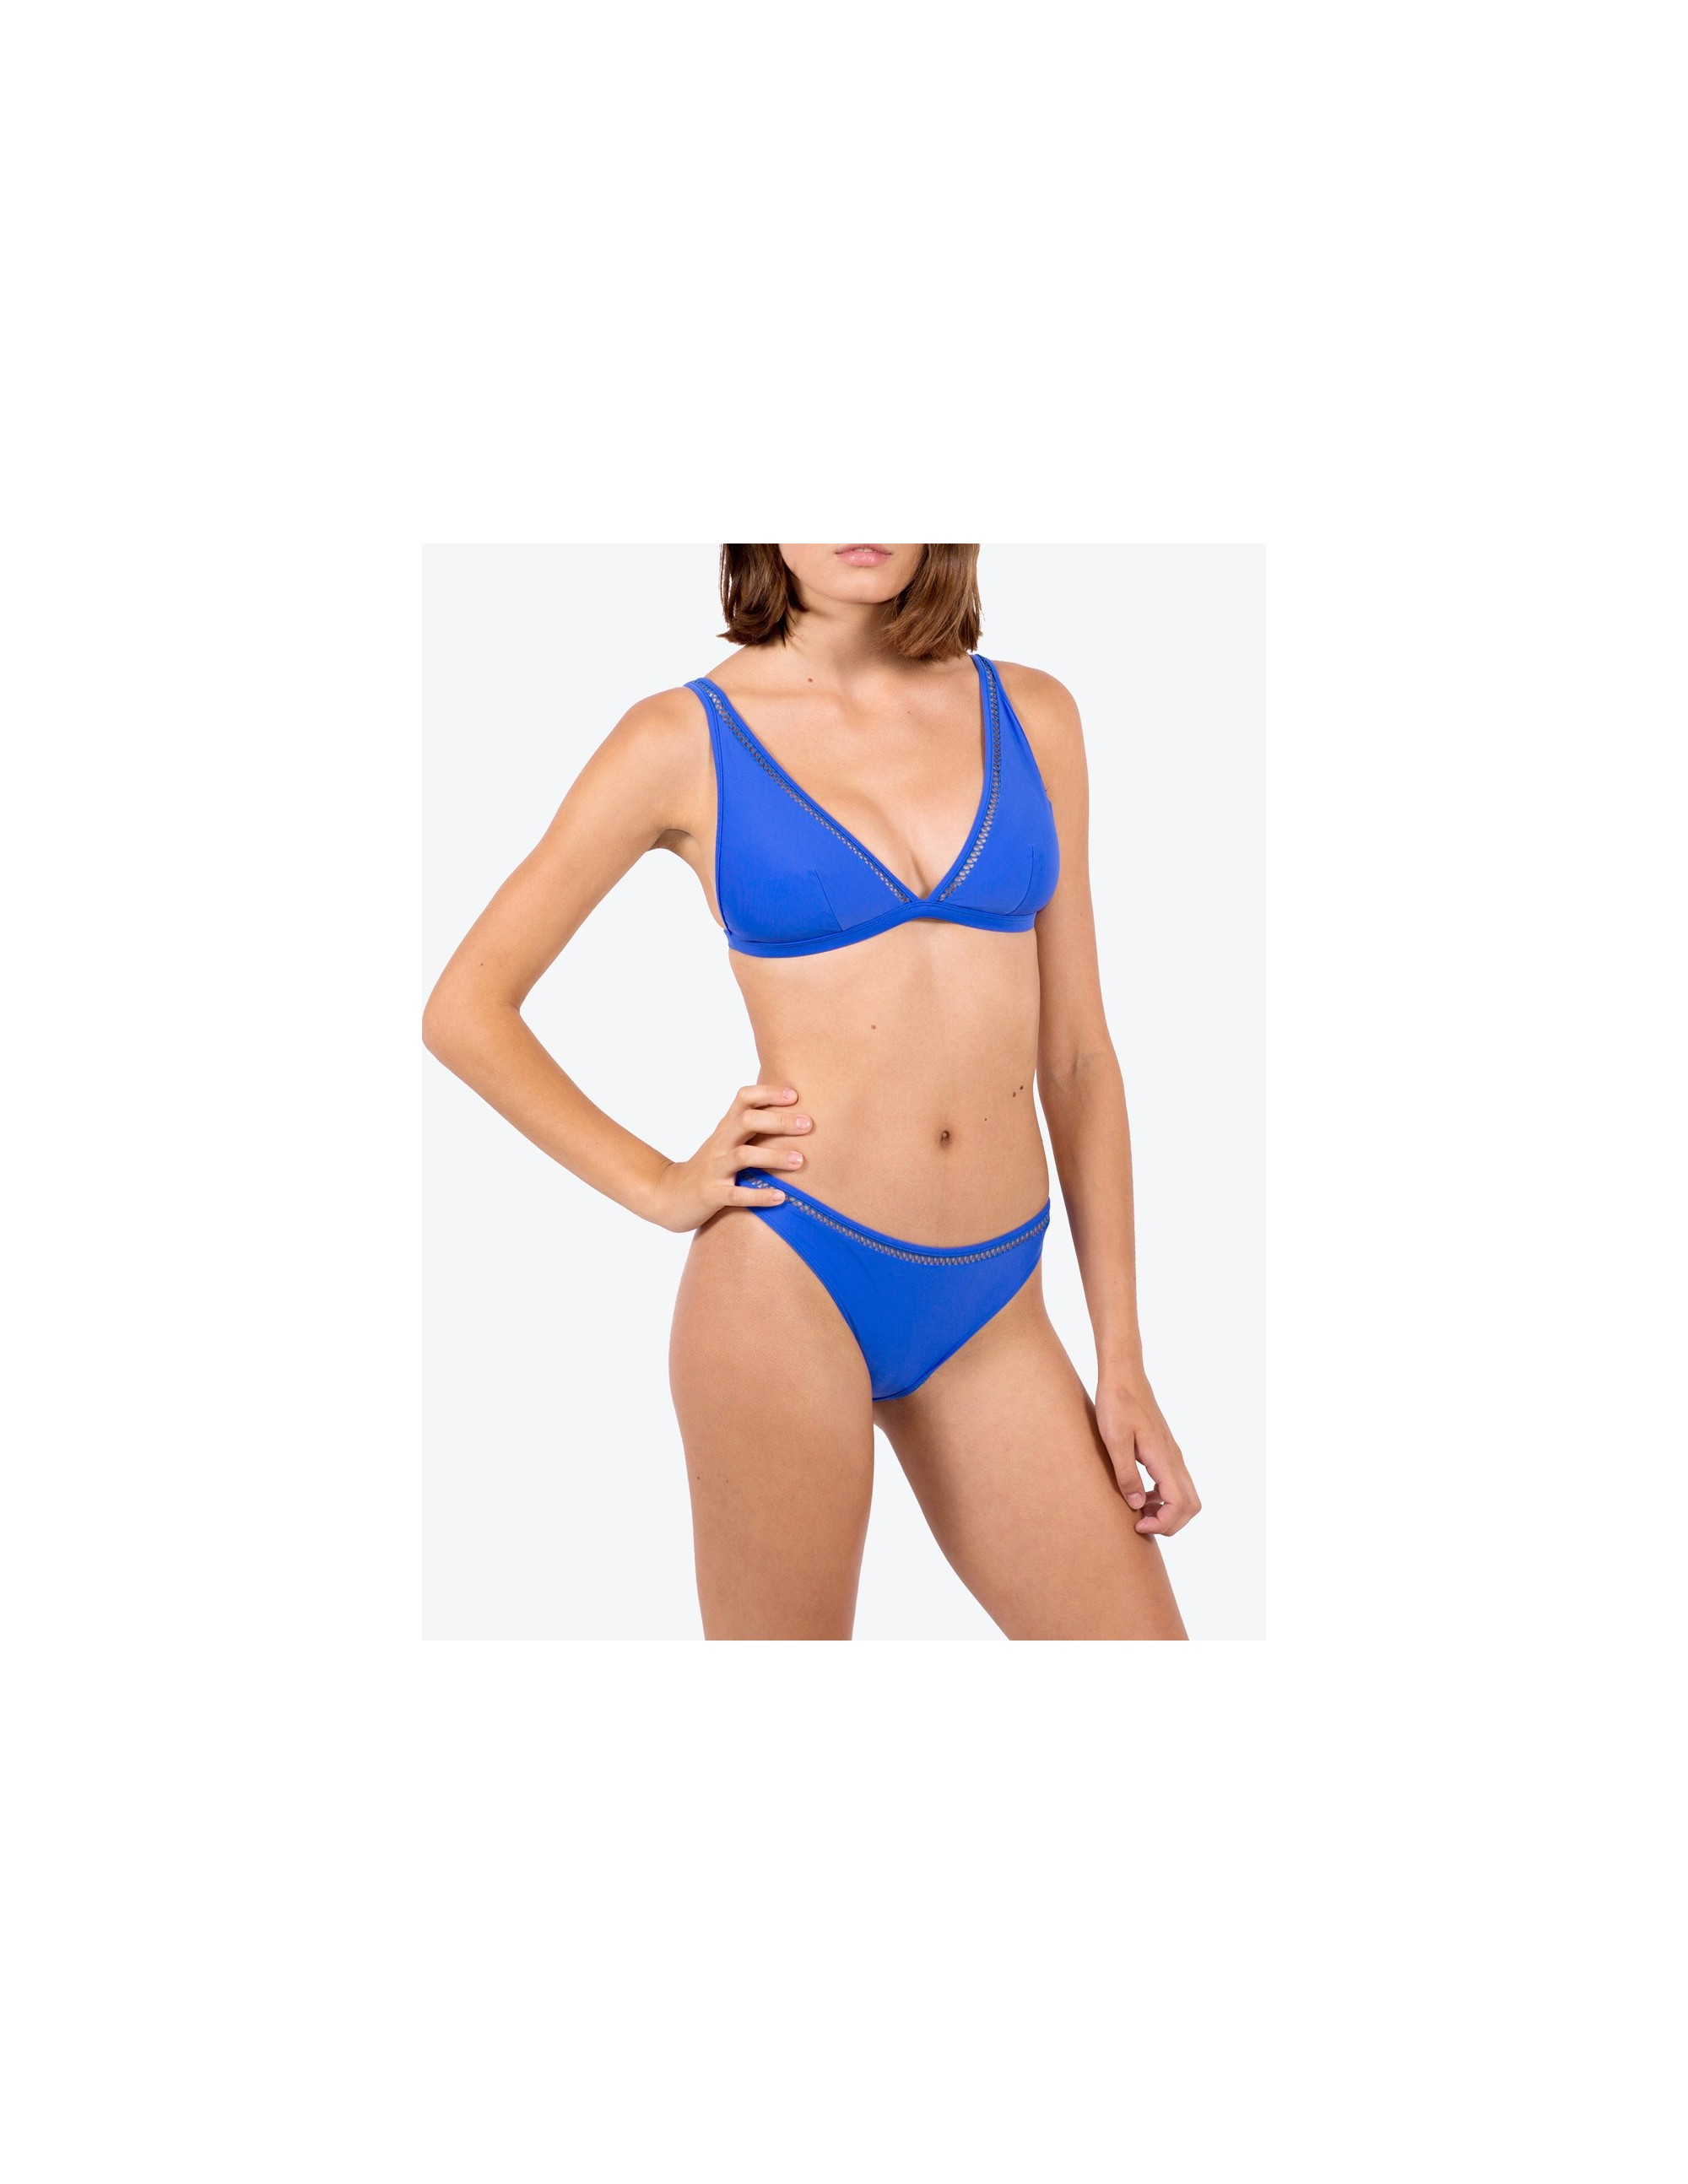 BELLA bikini bottom - ECHO BLUE